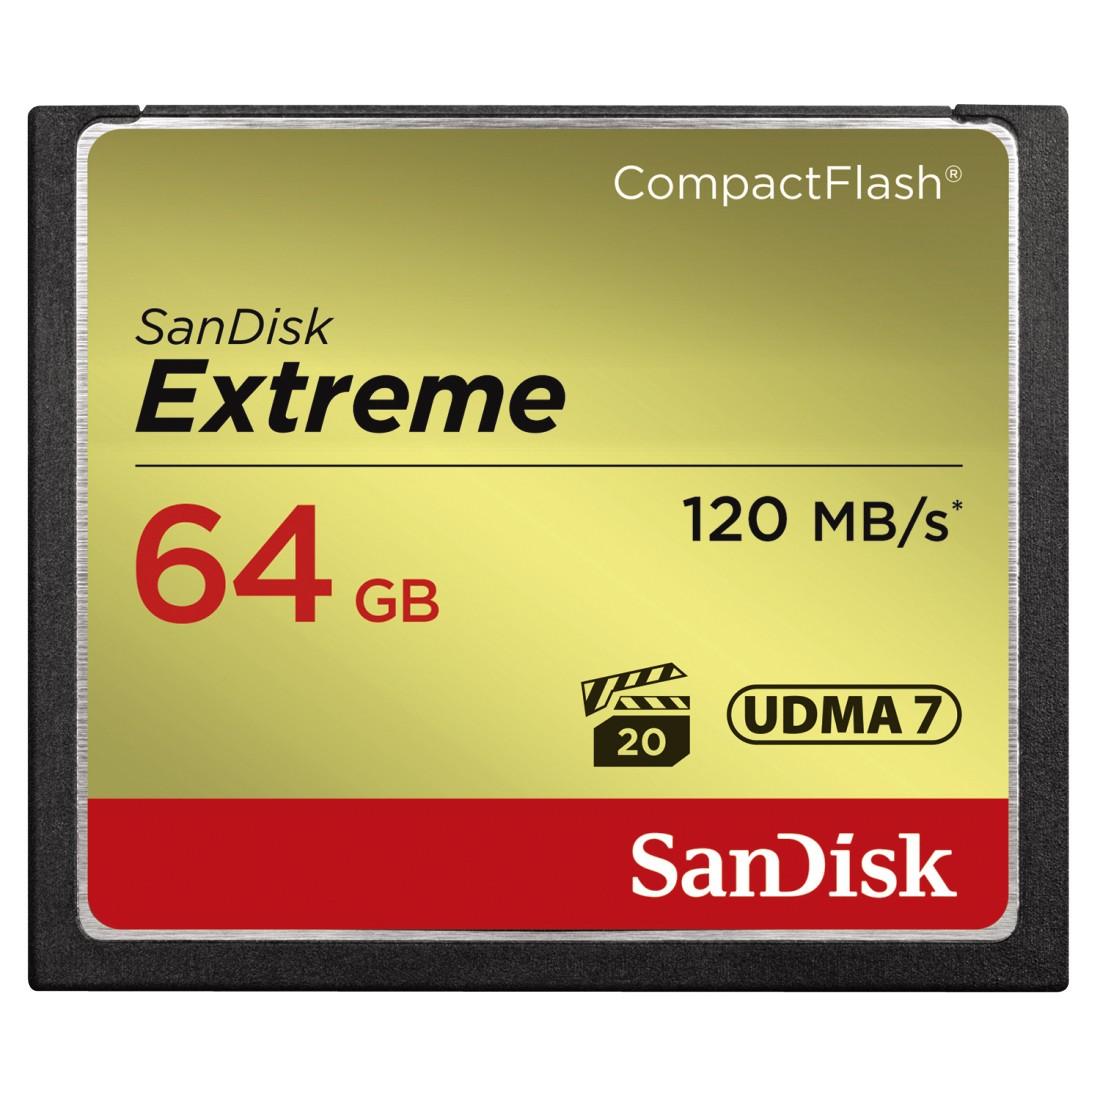 SanDisk Compact Flash 64GB Extreme (R:120/W:85 MB/s) UDMA7